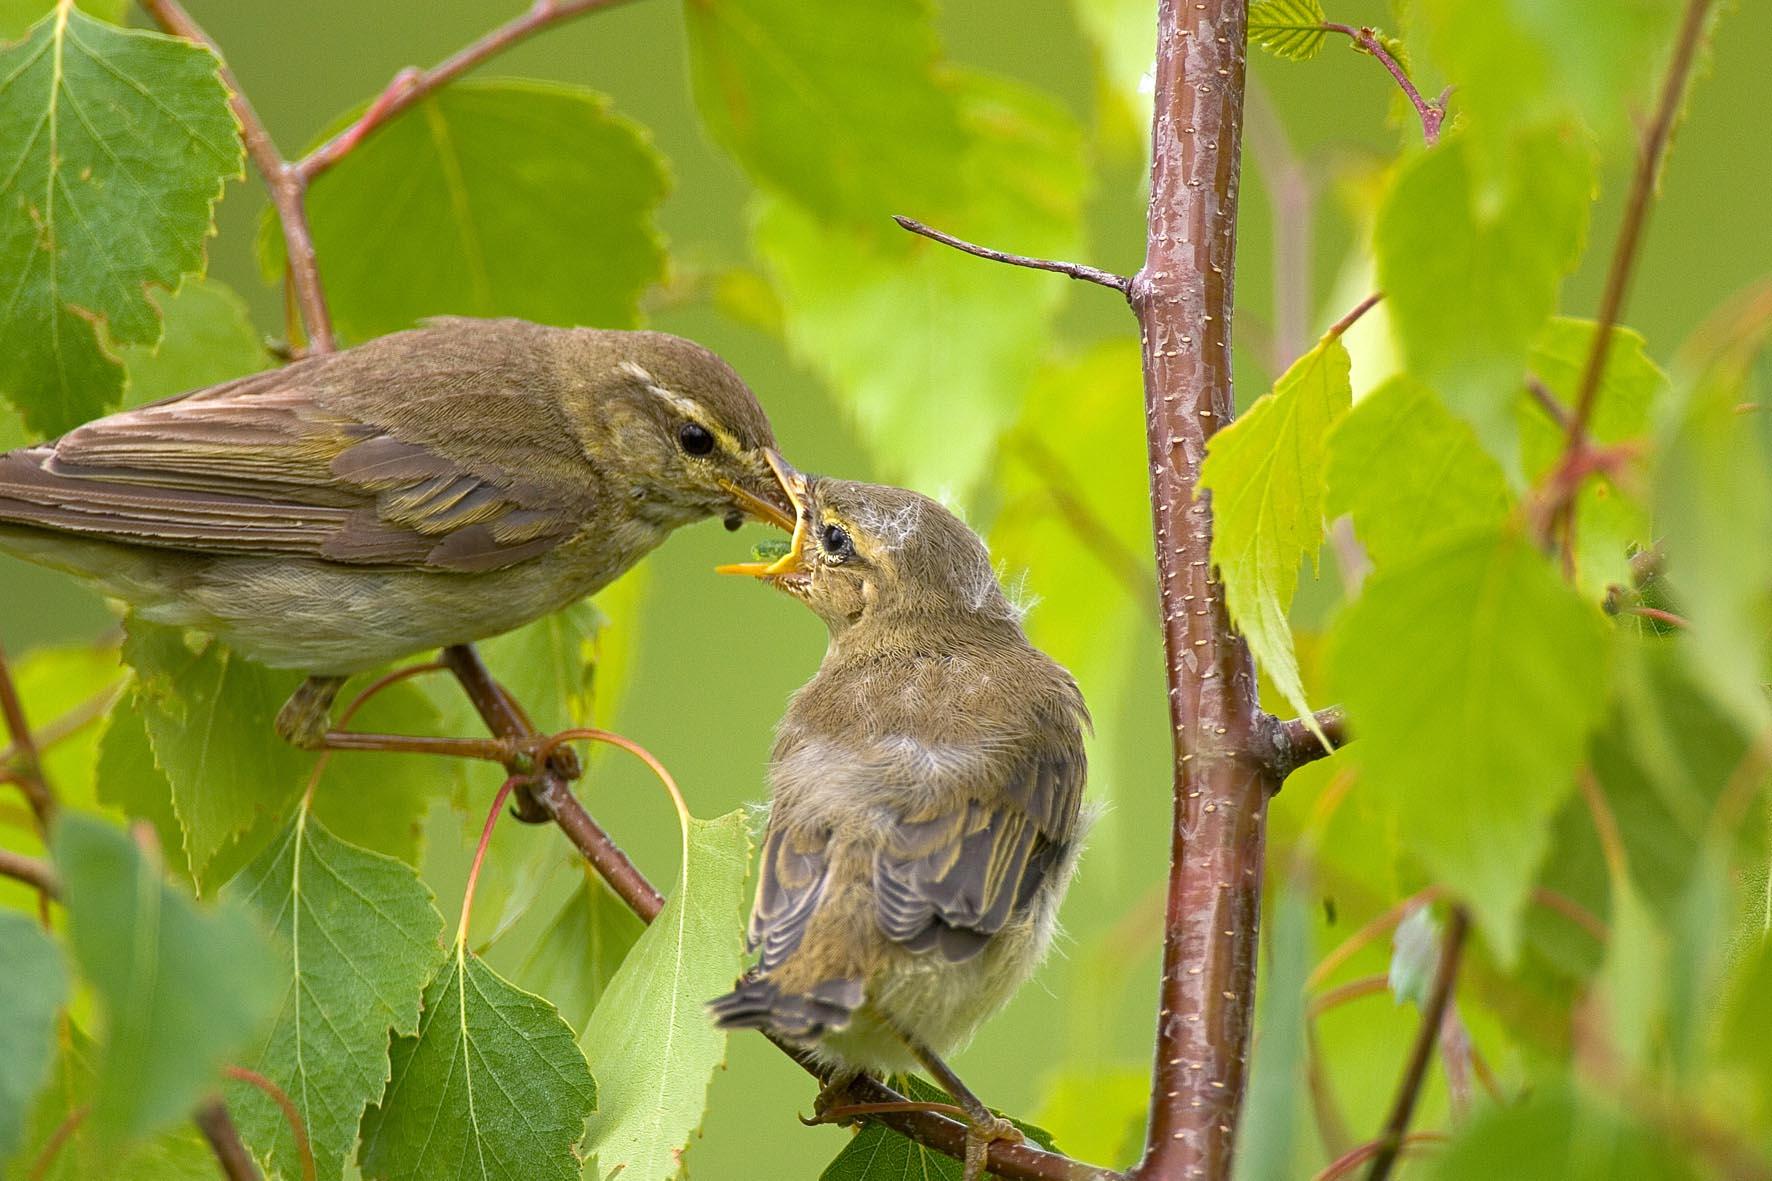 Vögel der Dellbrücker Heide